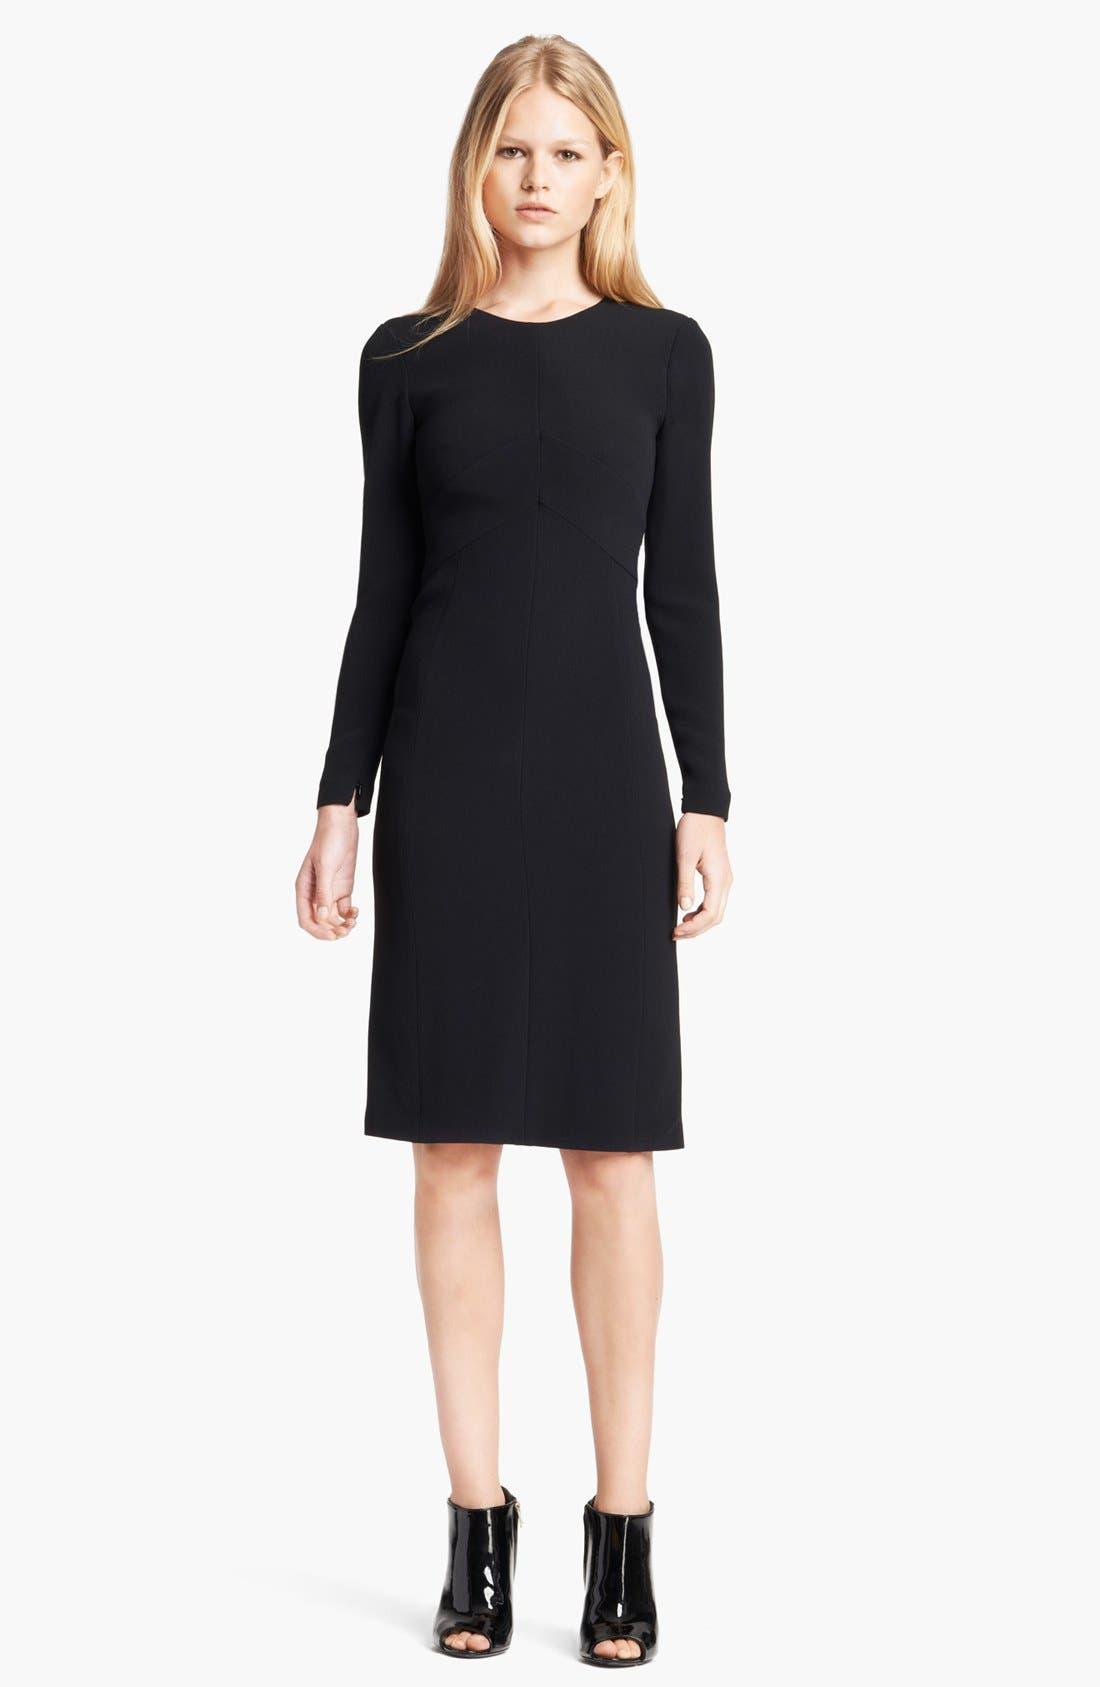 Main Image - Burberry Prorsum Chevron Detail Tailored Dress